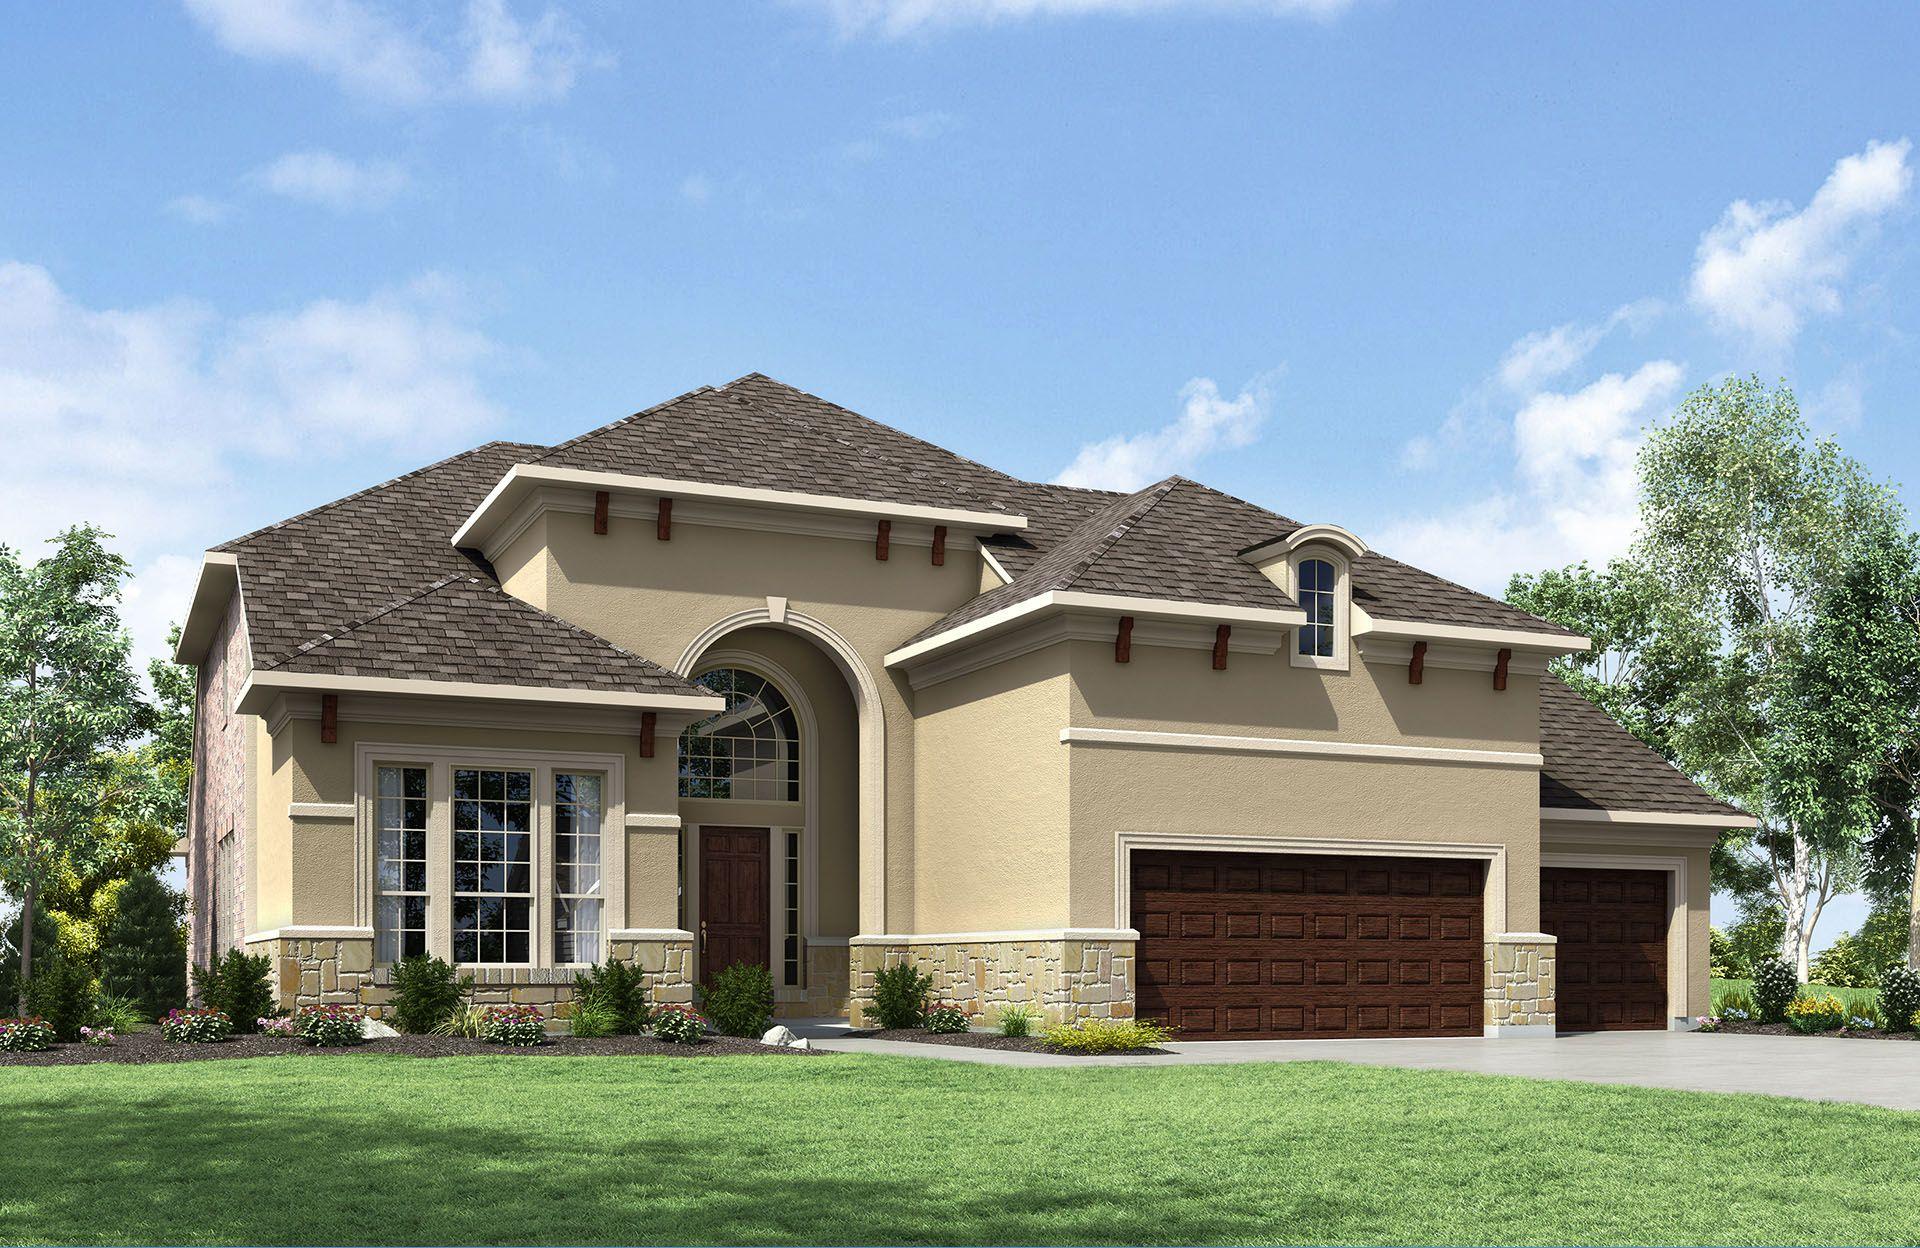 Single Family for Sale at Cimarron Hills - Kenwood Ii 307 Flint Ridge Trail Georgetown, Texas 78628 United States